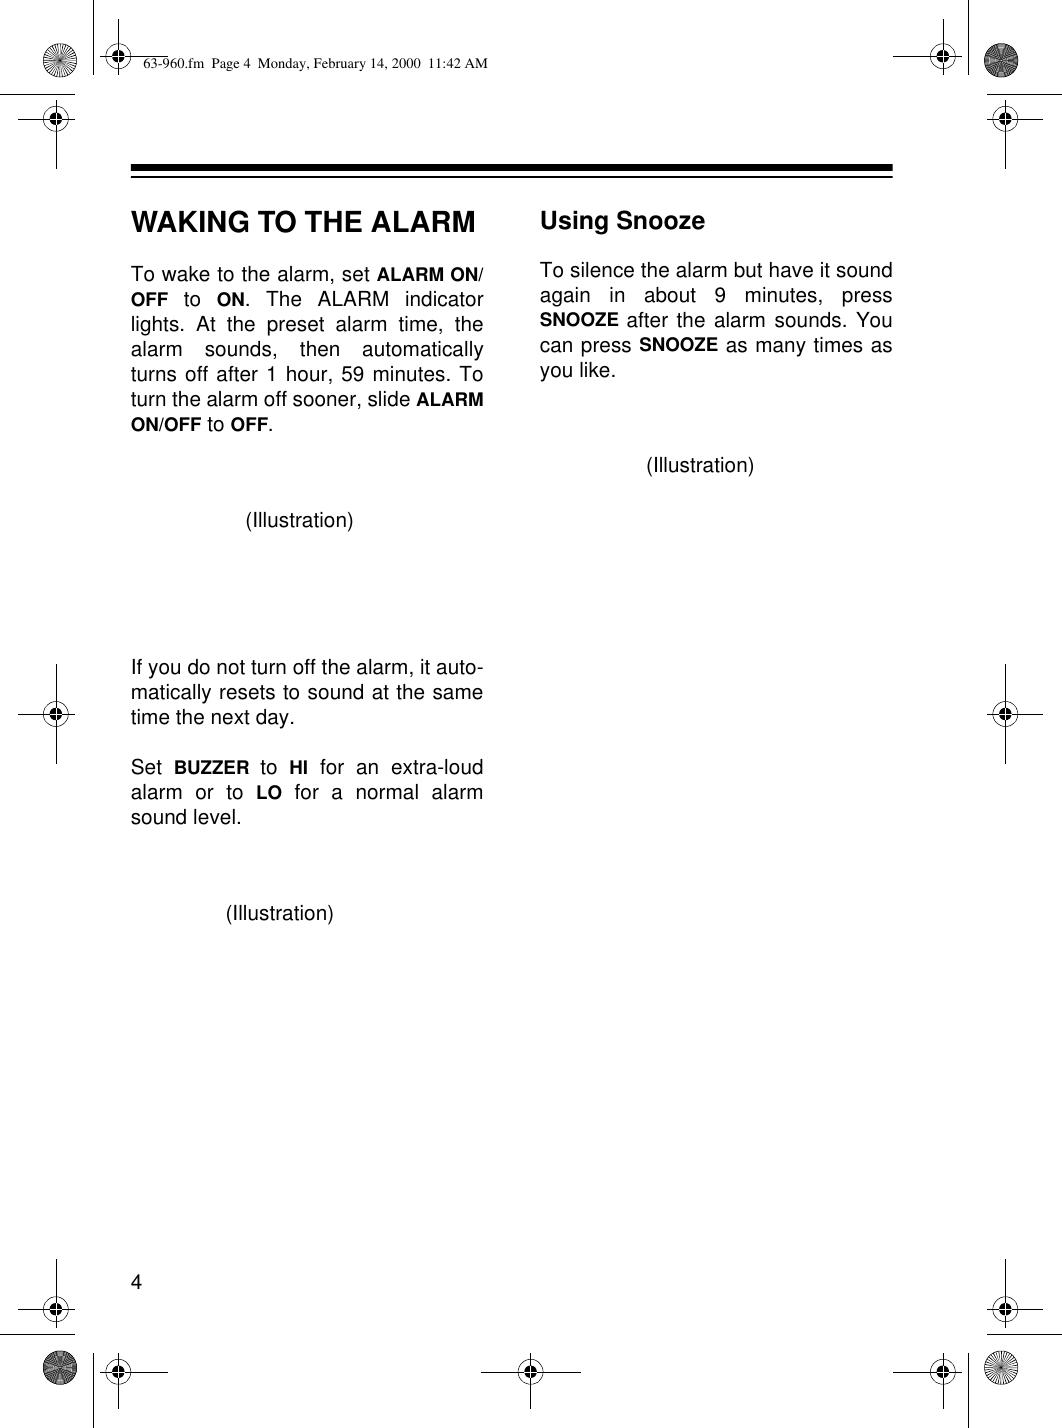 Radio Shack 63 960 Users Manual